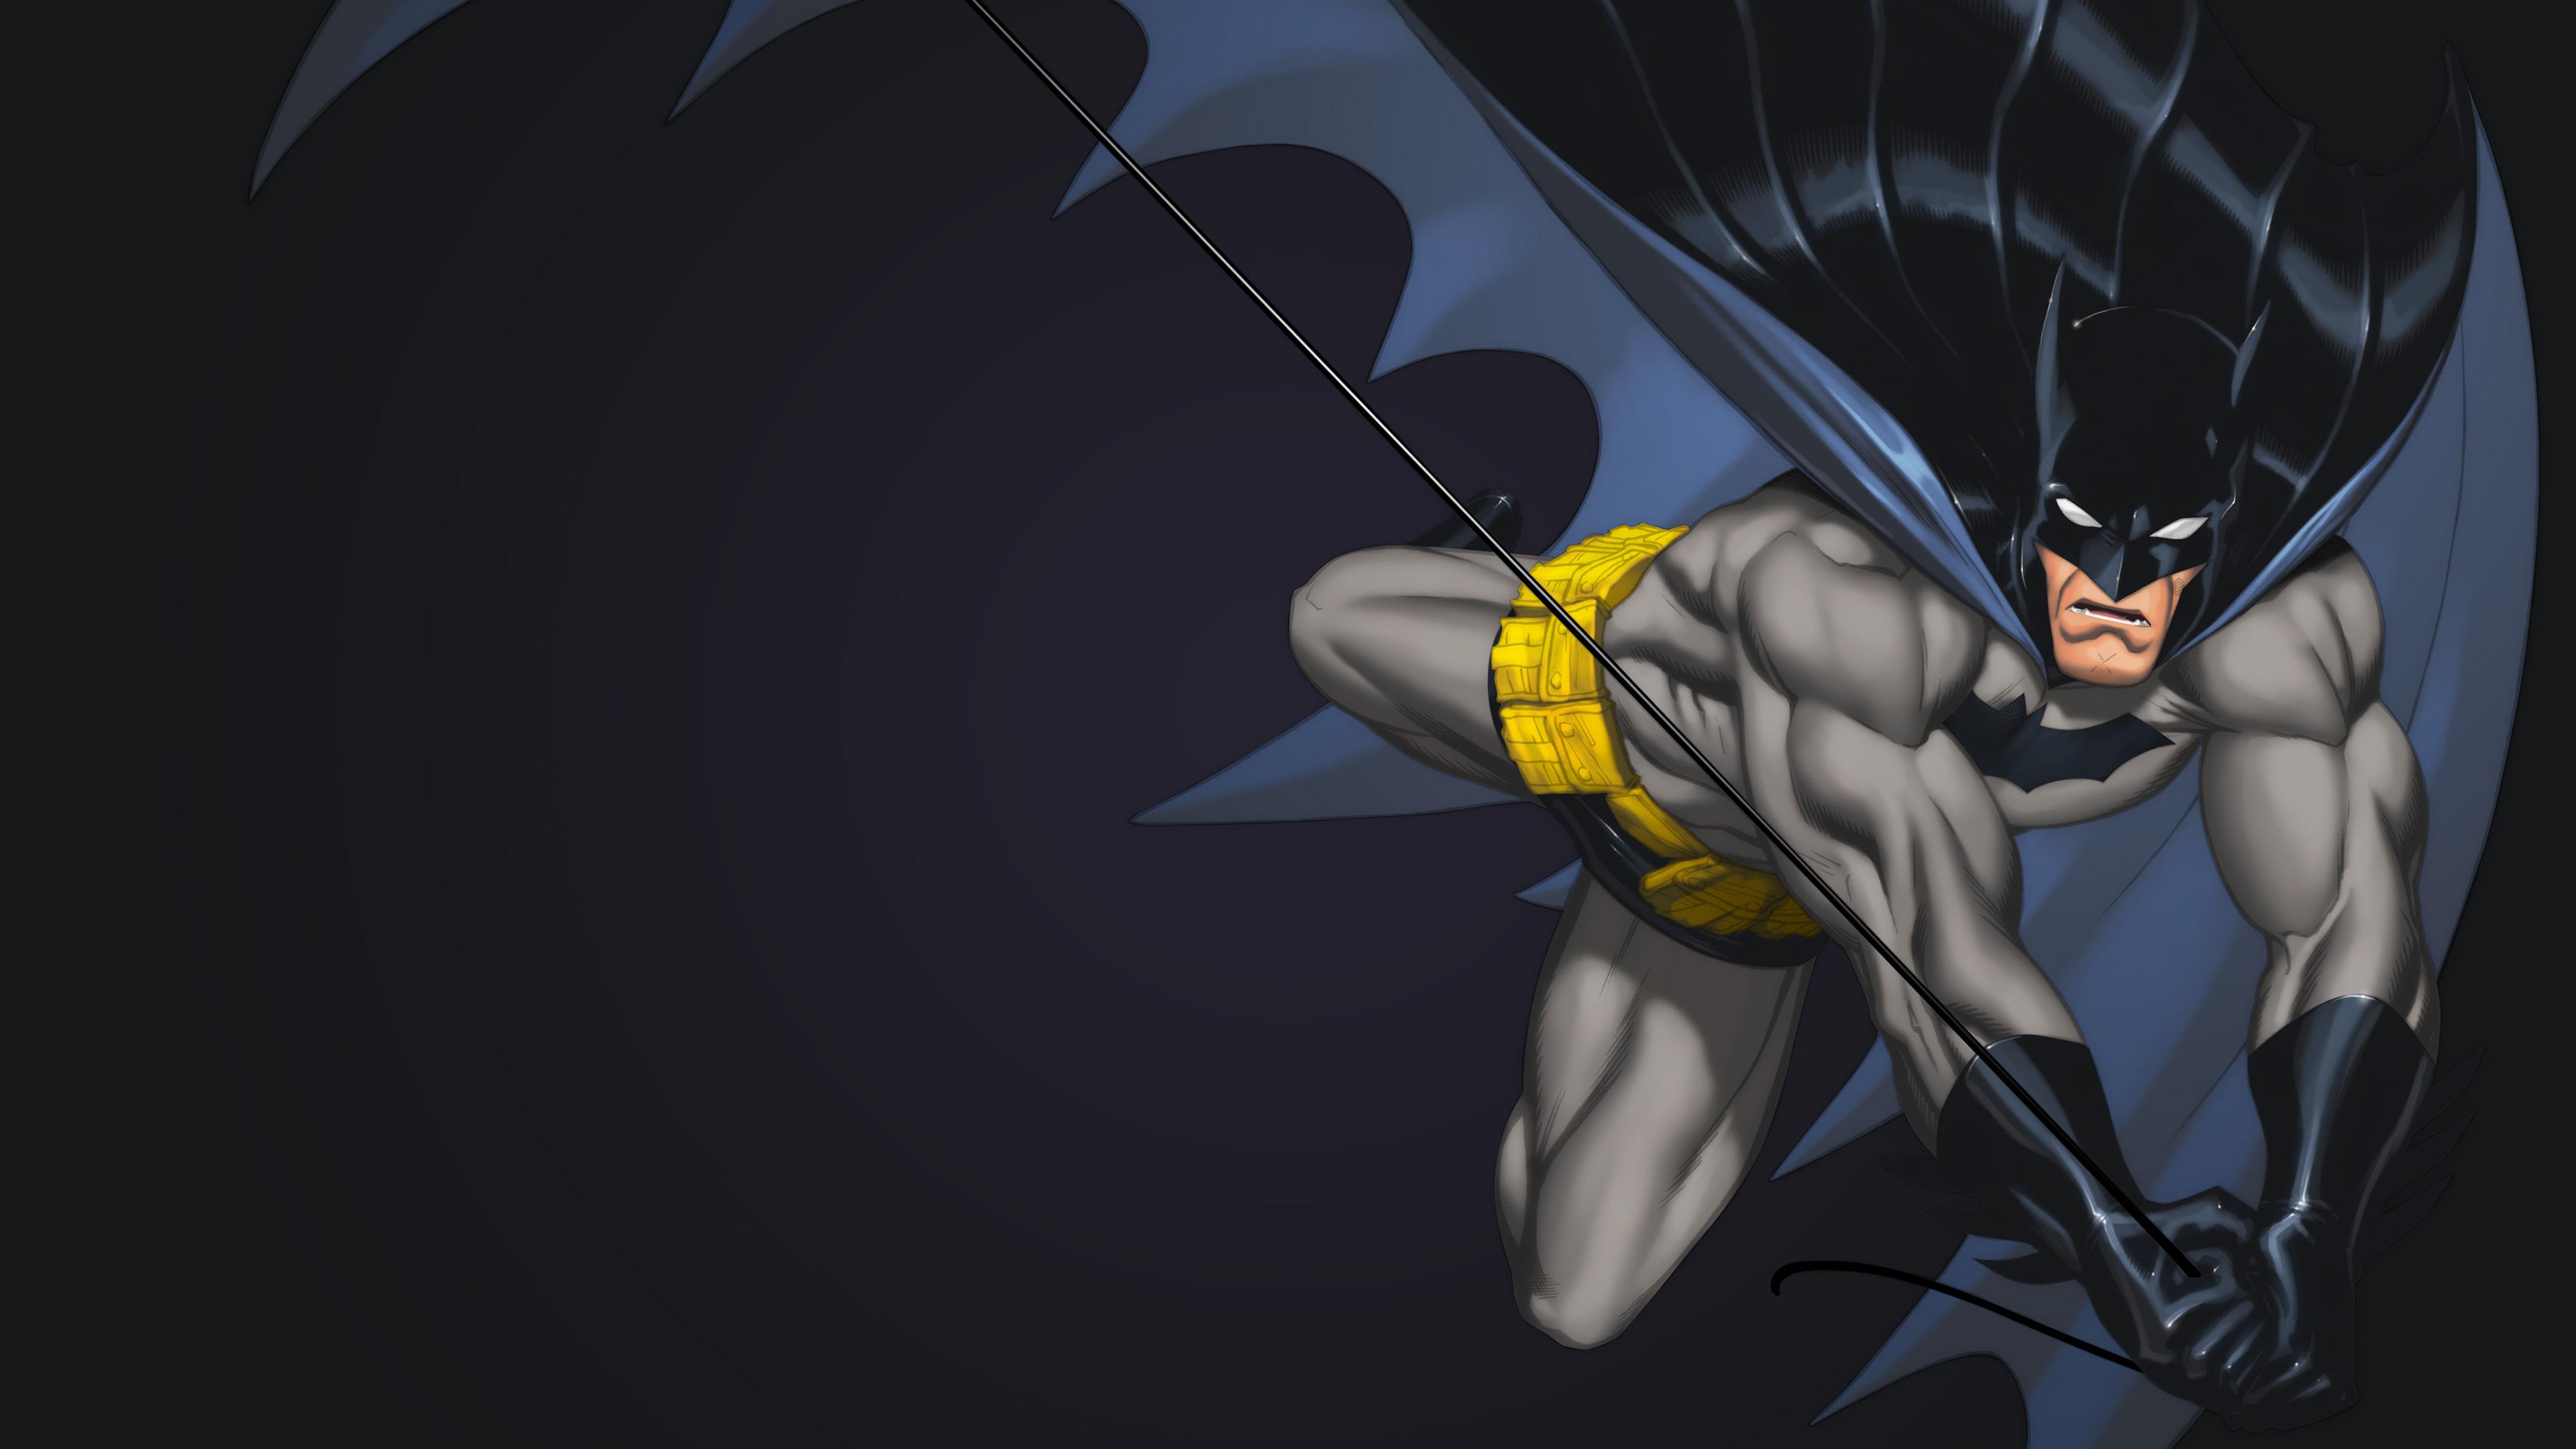 batman art 4k superhero 1537646066 - Batman Art 4k Superhero - superheroes wallpapers, digital art wallpapers, behance wallpapers, batman wallpapers, artwork wallpapers, artist wallpapers, art wallpapers, 4k-wallpapers